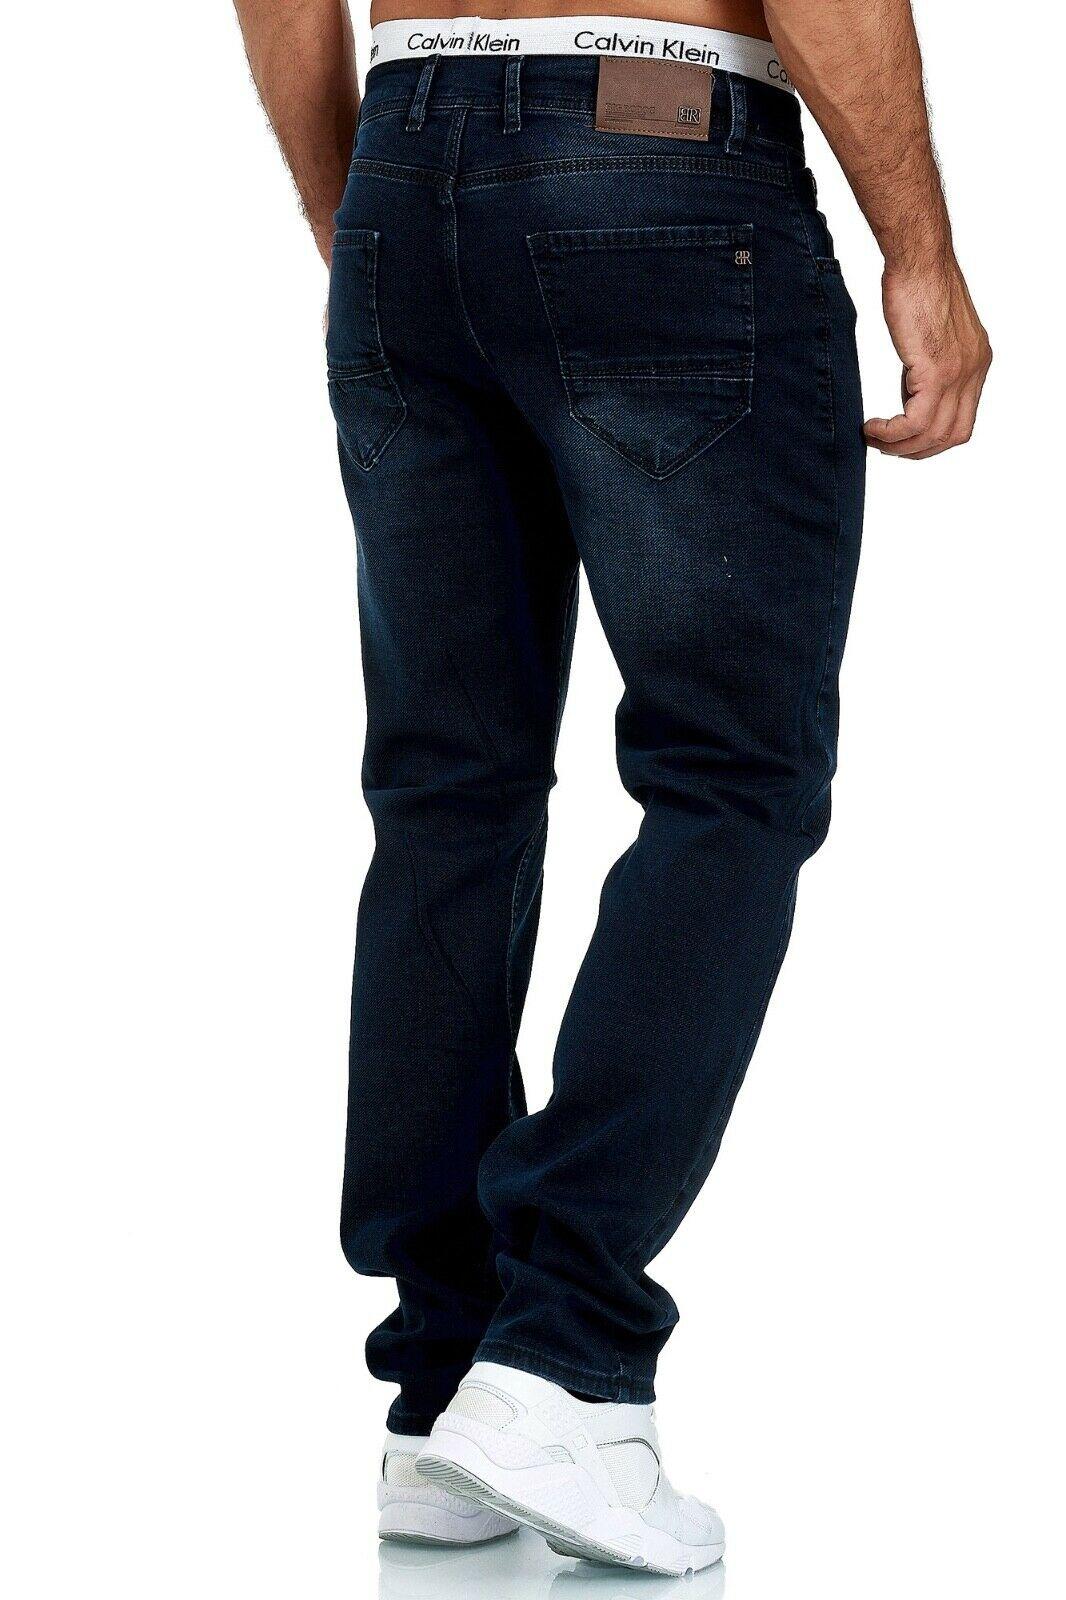 Herren-Jeans-Hose-Denim-KC-Black-Washed-Straight-Cut-Regular-Dicke-Naht-naehte Indexbild 89